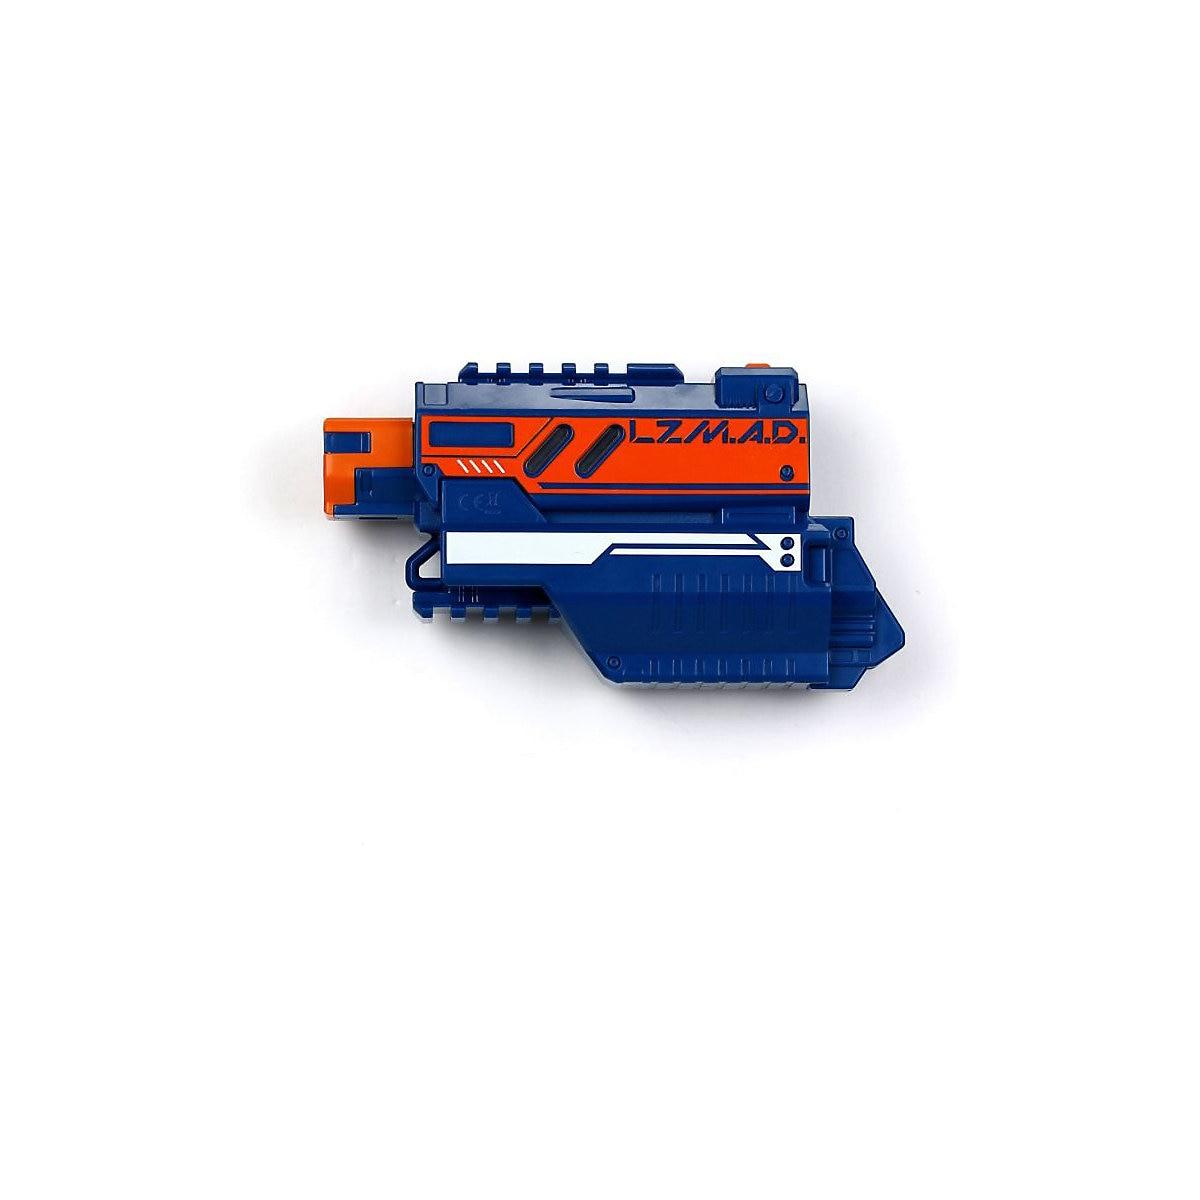 Silverlit jouet pistolets 10077719 pistolet arme jouets jeux pneumatique blaster garçon orbiz revolver plein air Fun Sports